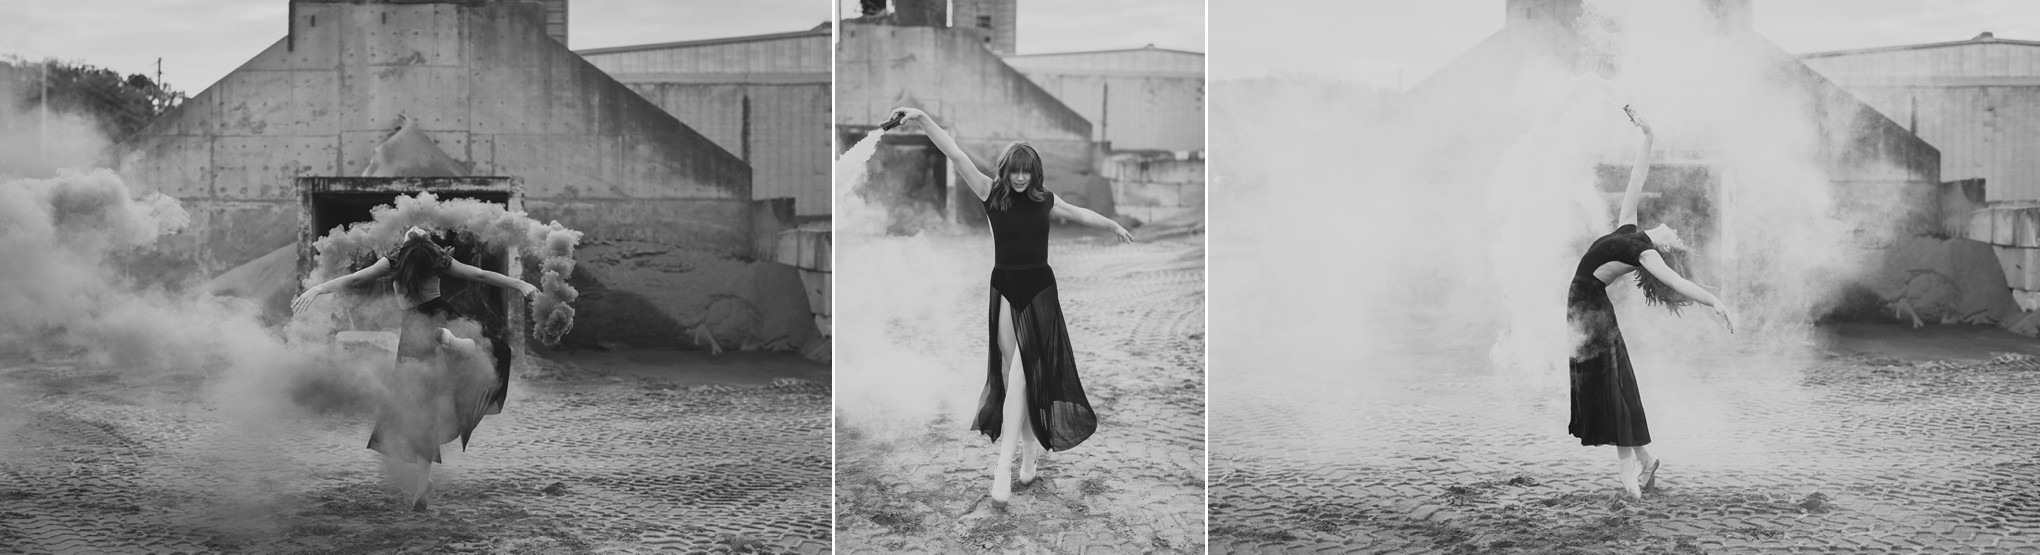 AdrienneHildenbrand-Senior175_blake_mccollum_photography.jpg